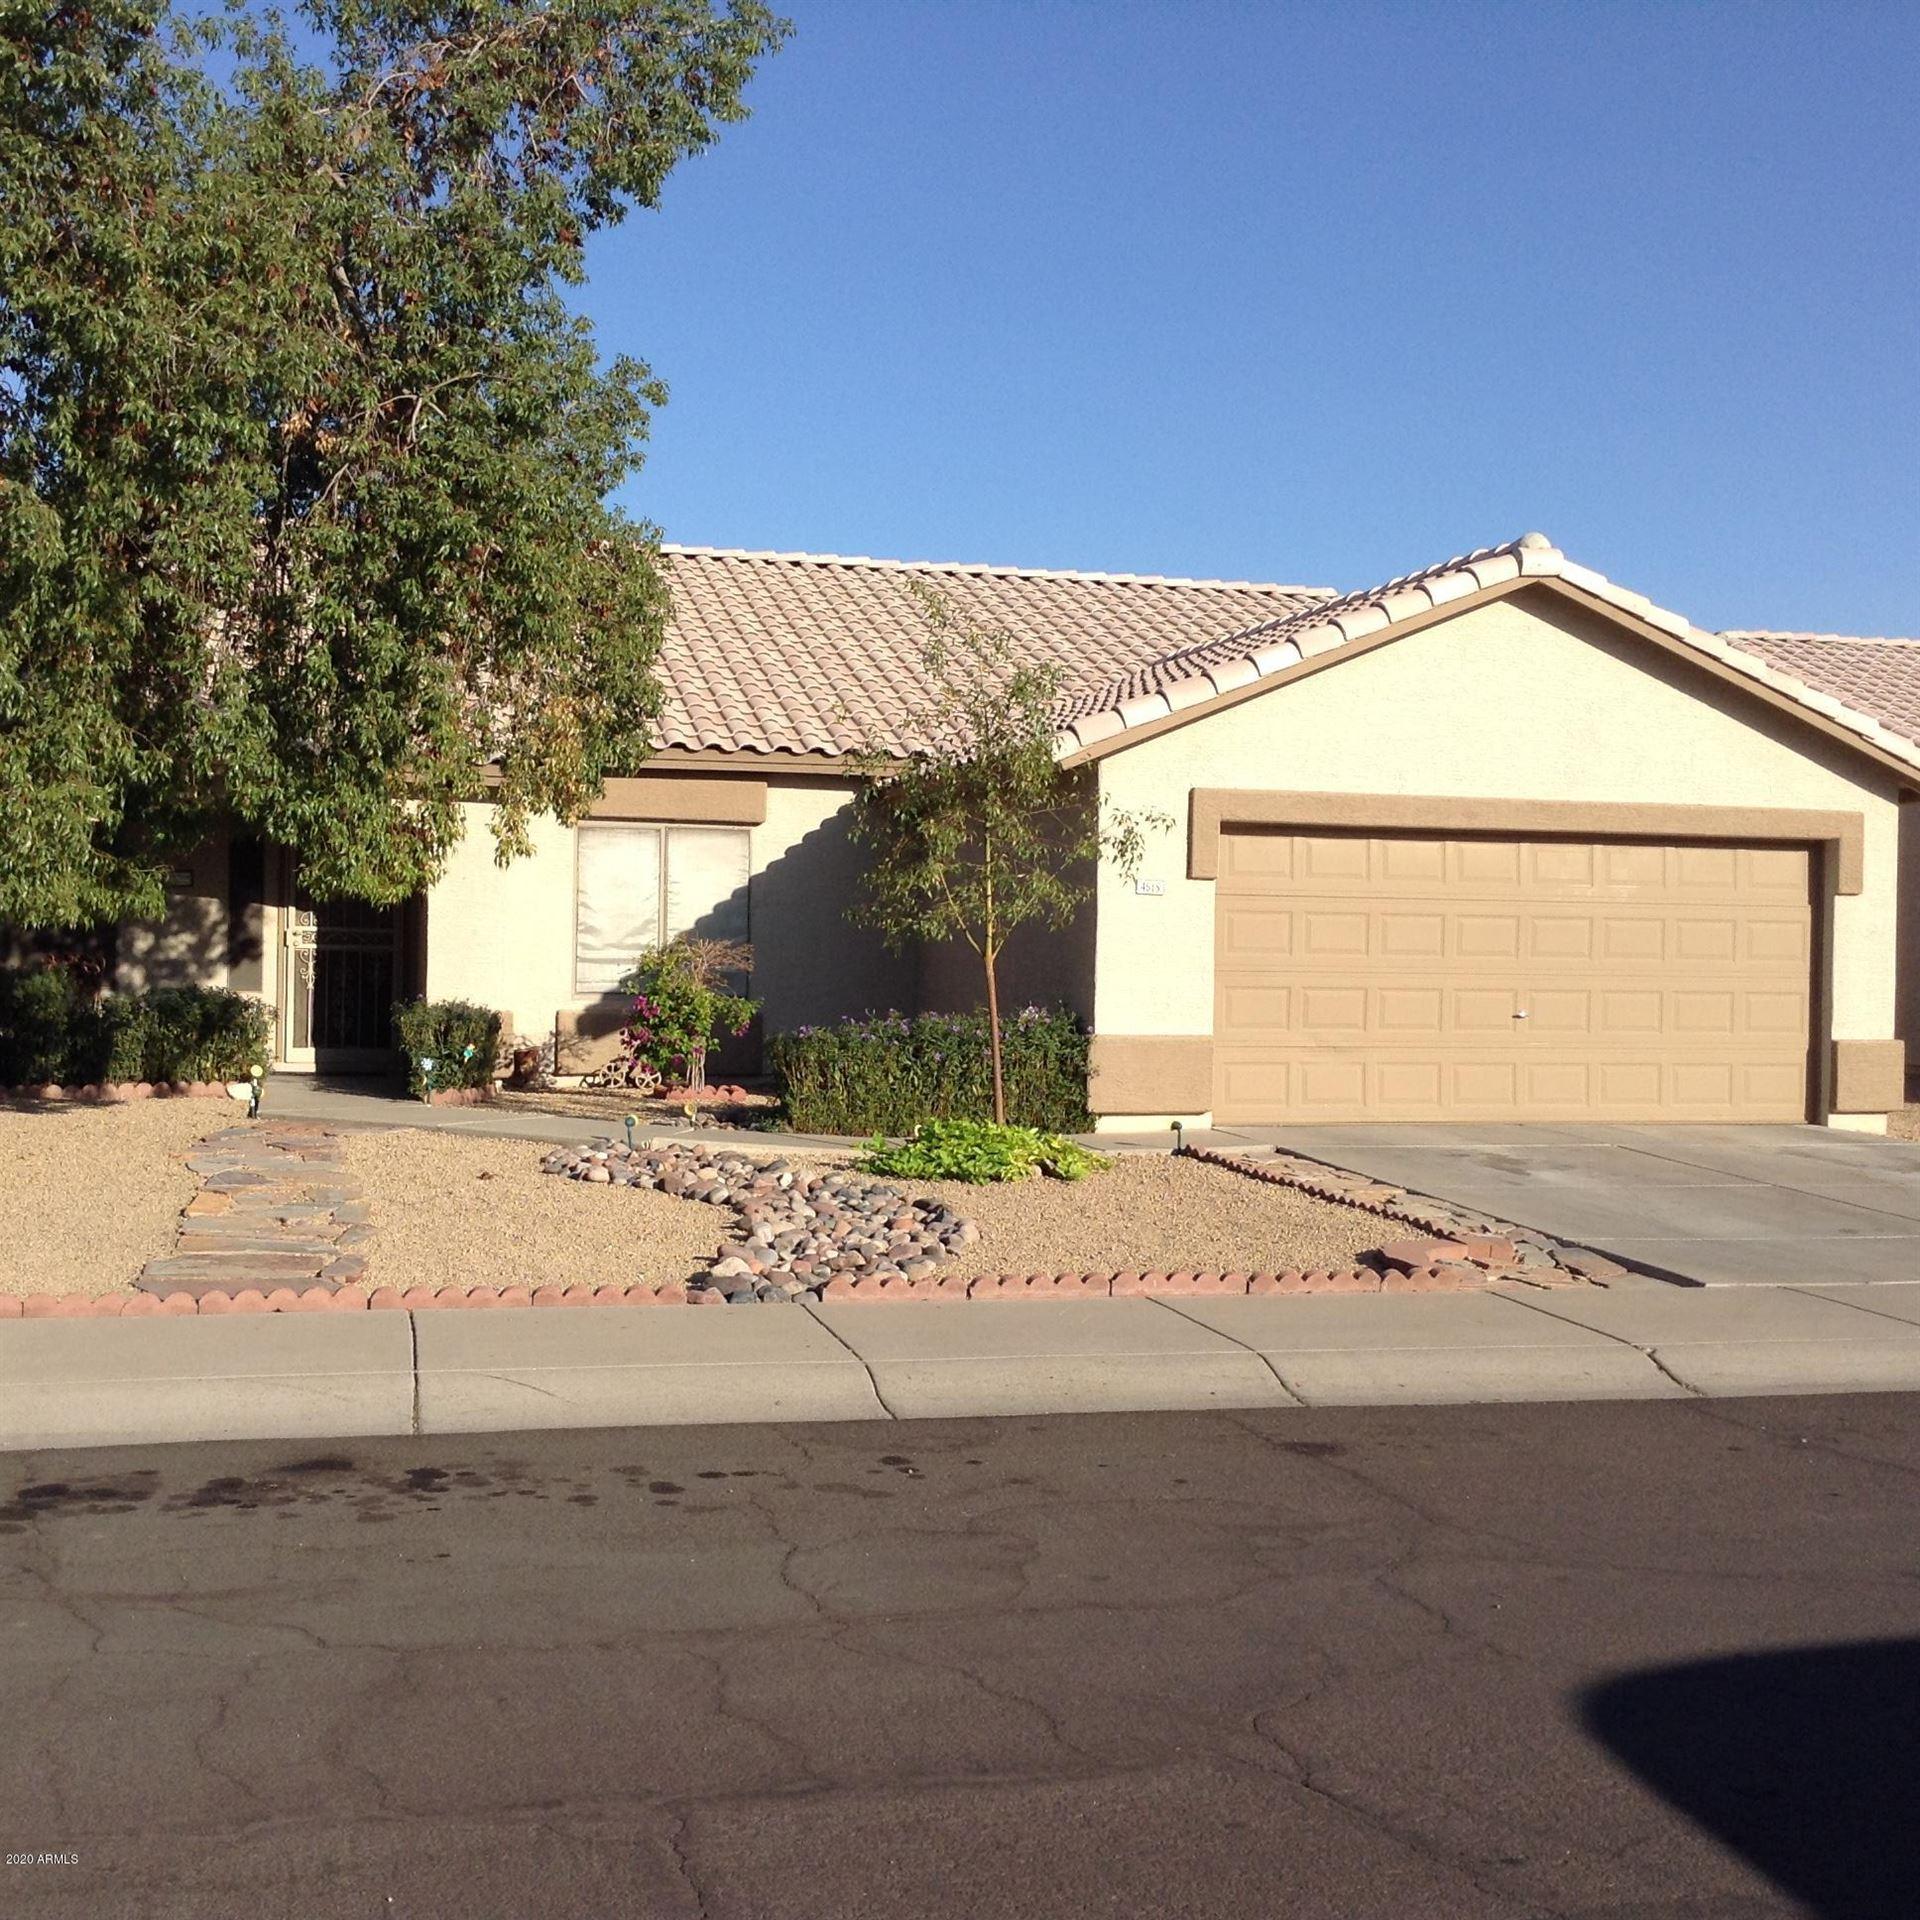 4515 N 86th Avenue, Phoenix, AZ 85037 - MLS#: 6151532